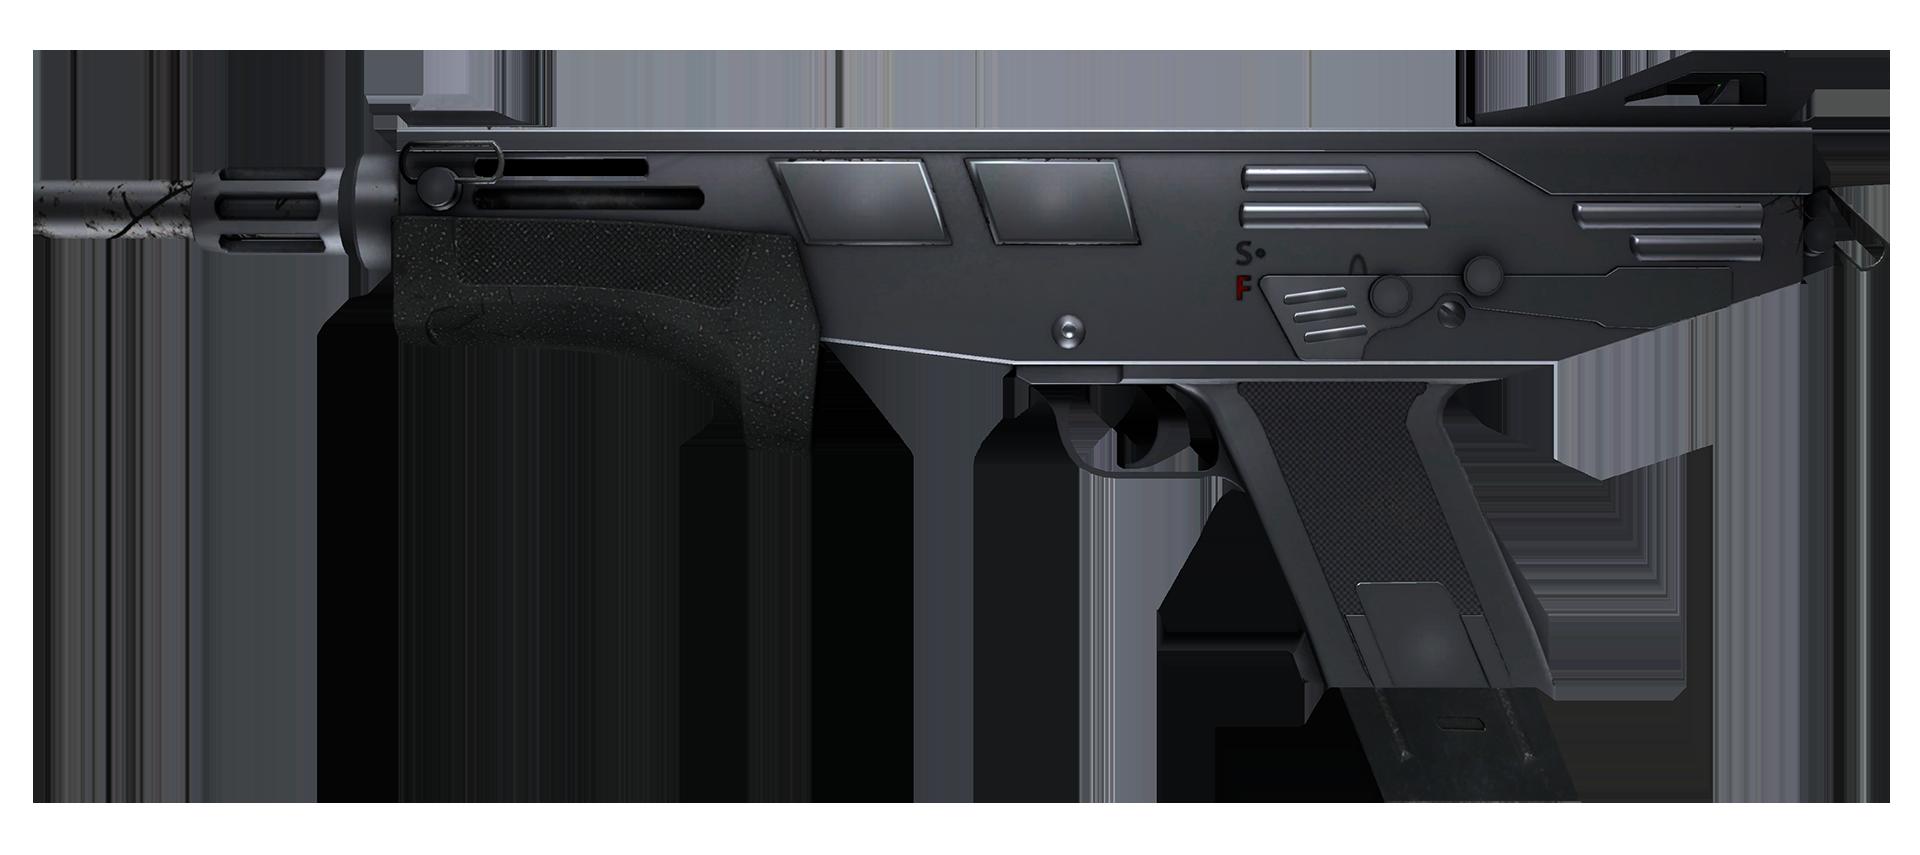 MAG-7 Silver Large Rendering